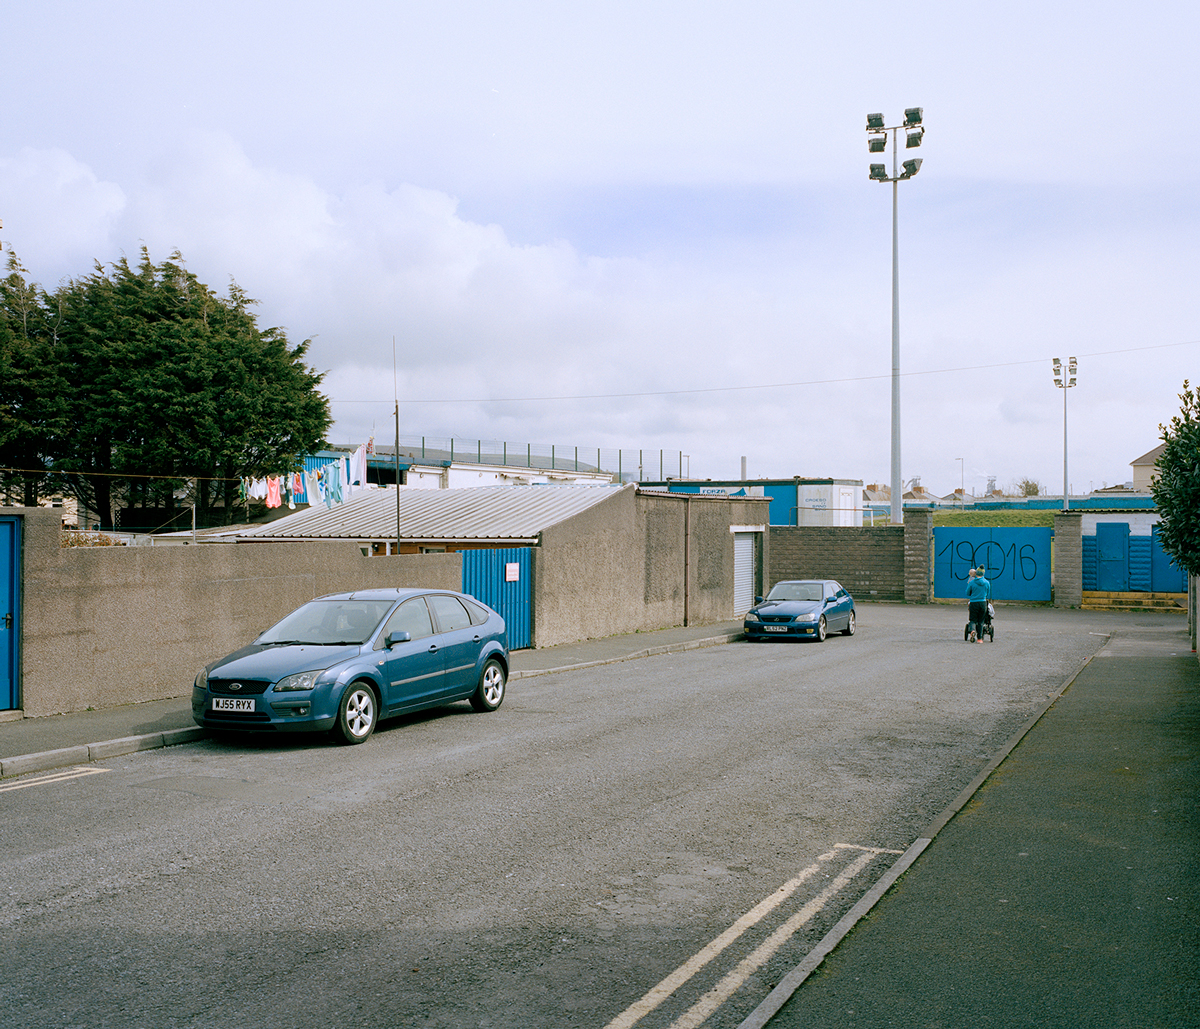 Port Talbot 19